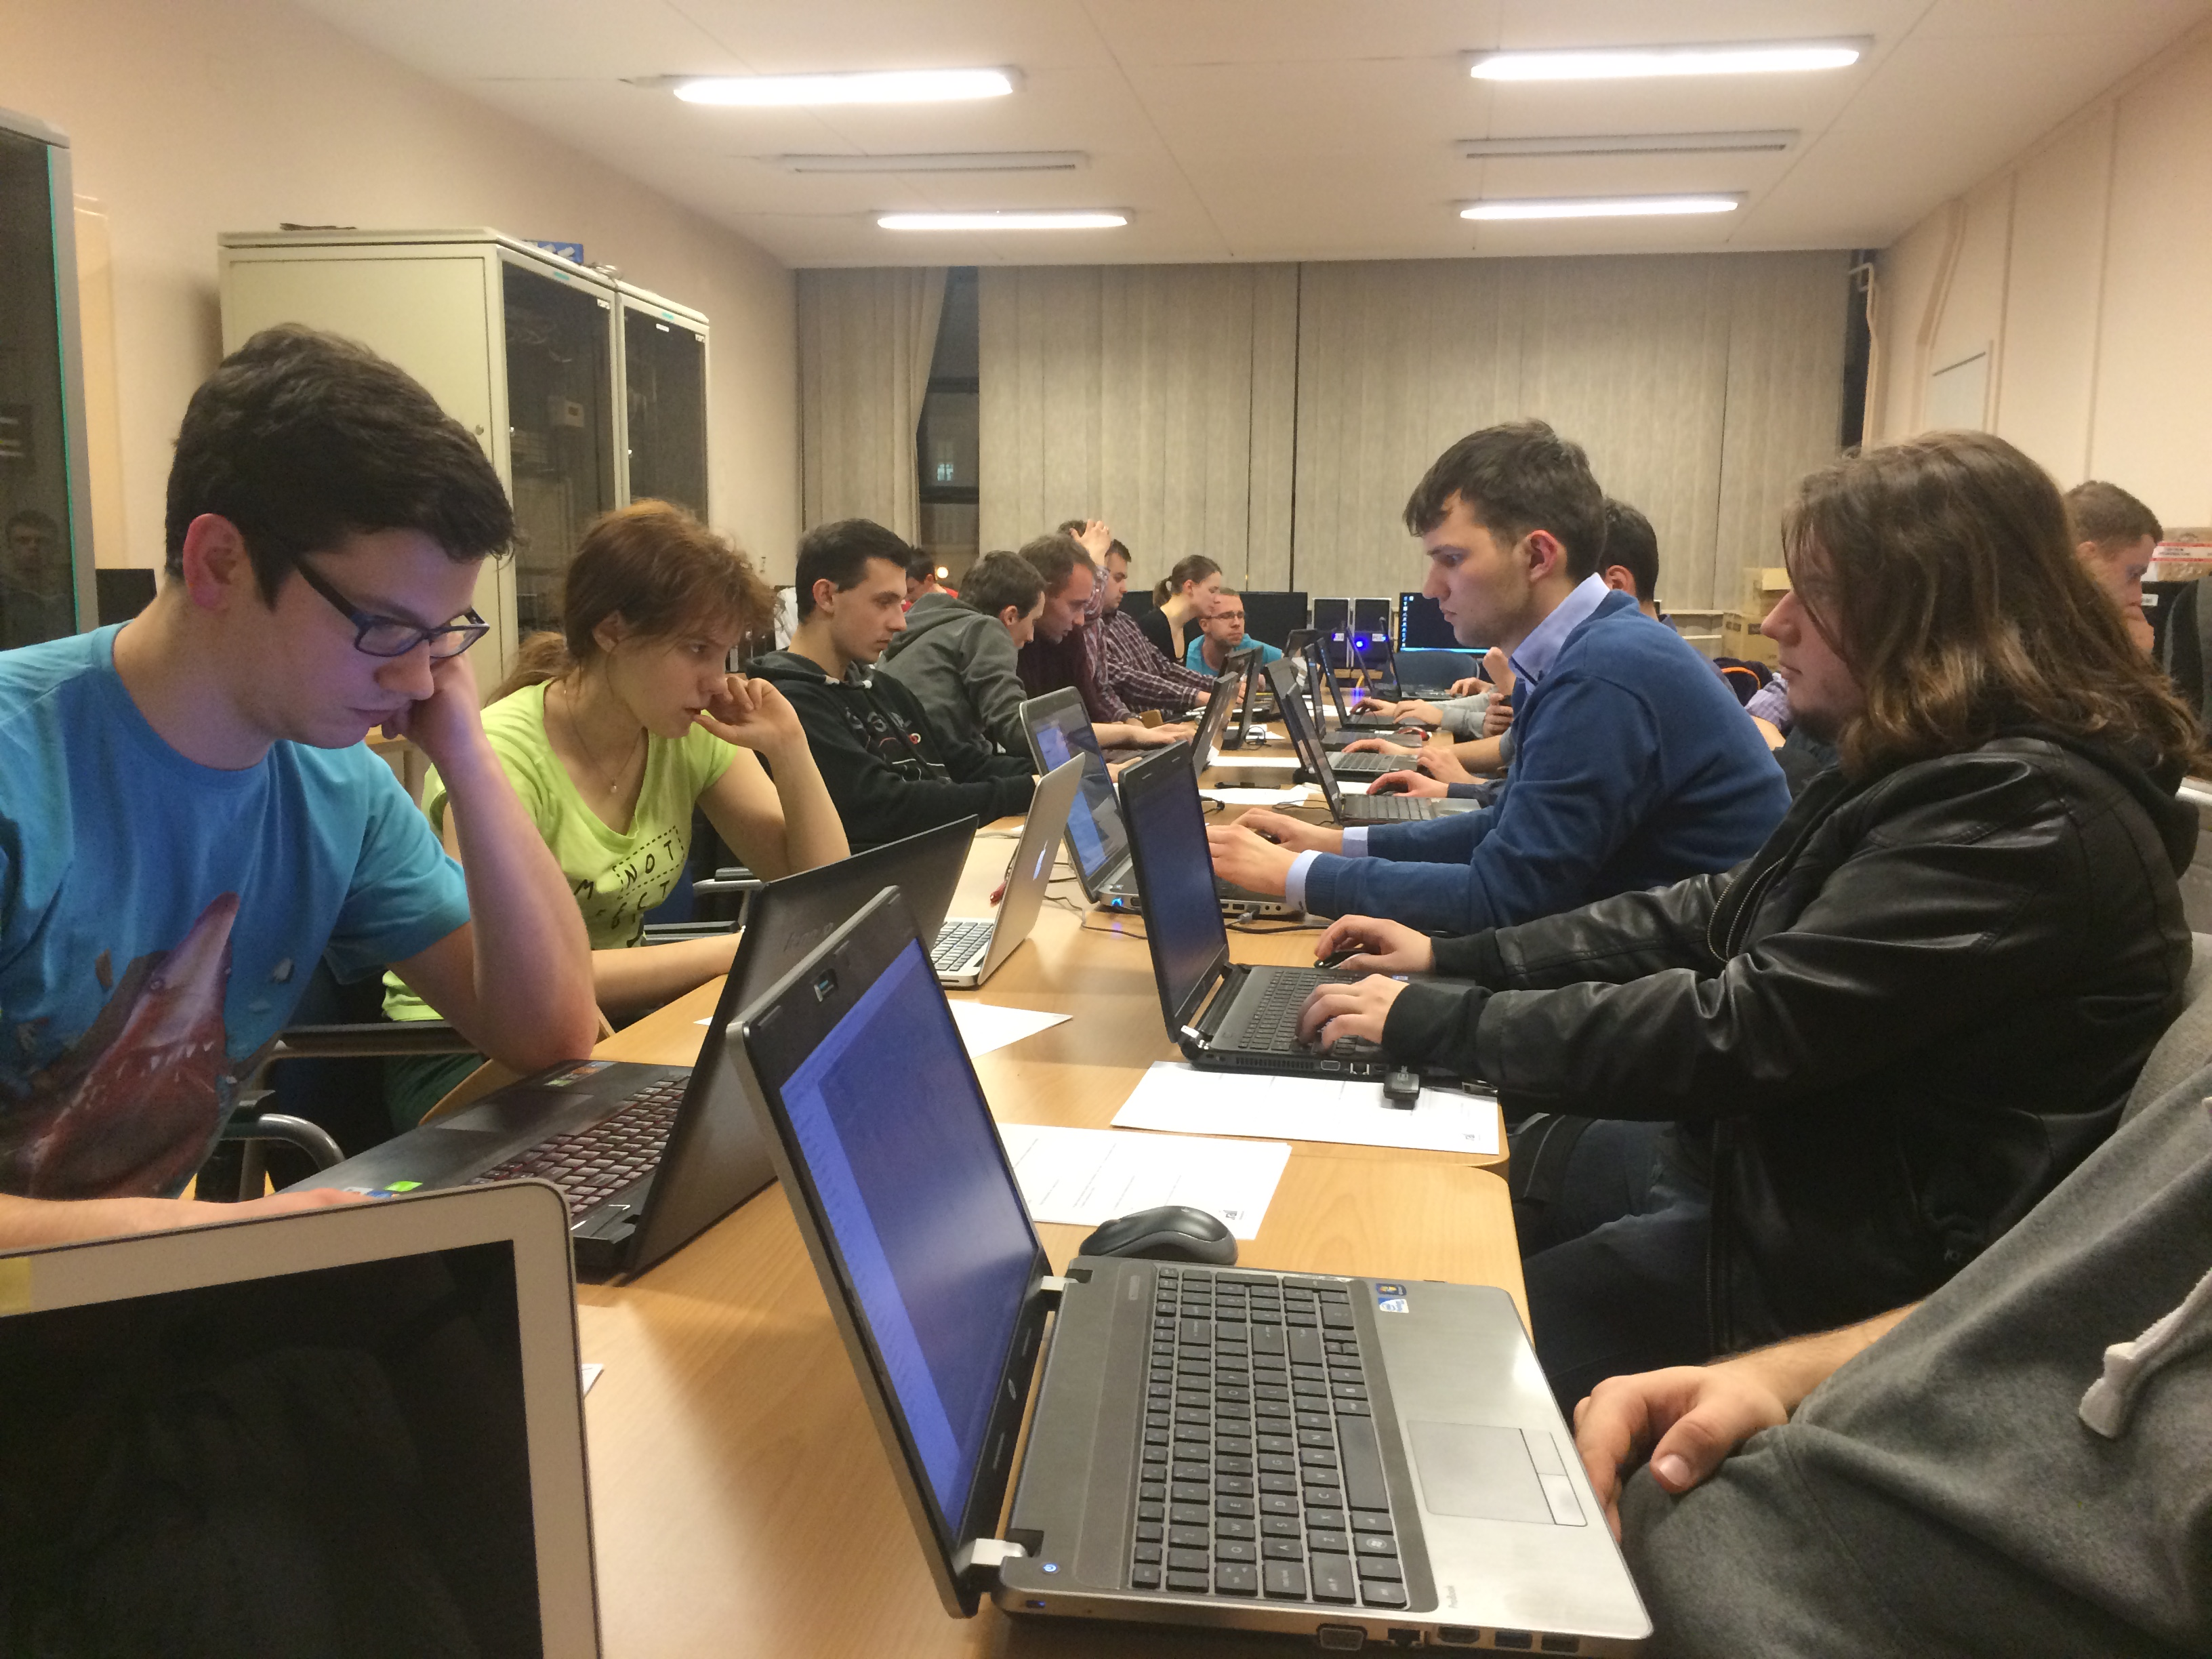 Ruby on Rails Development Workshops in Poland